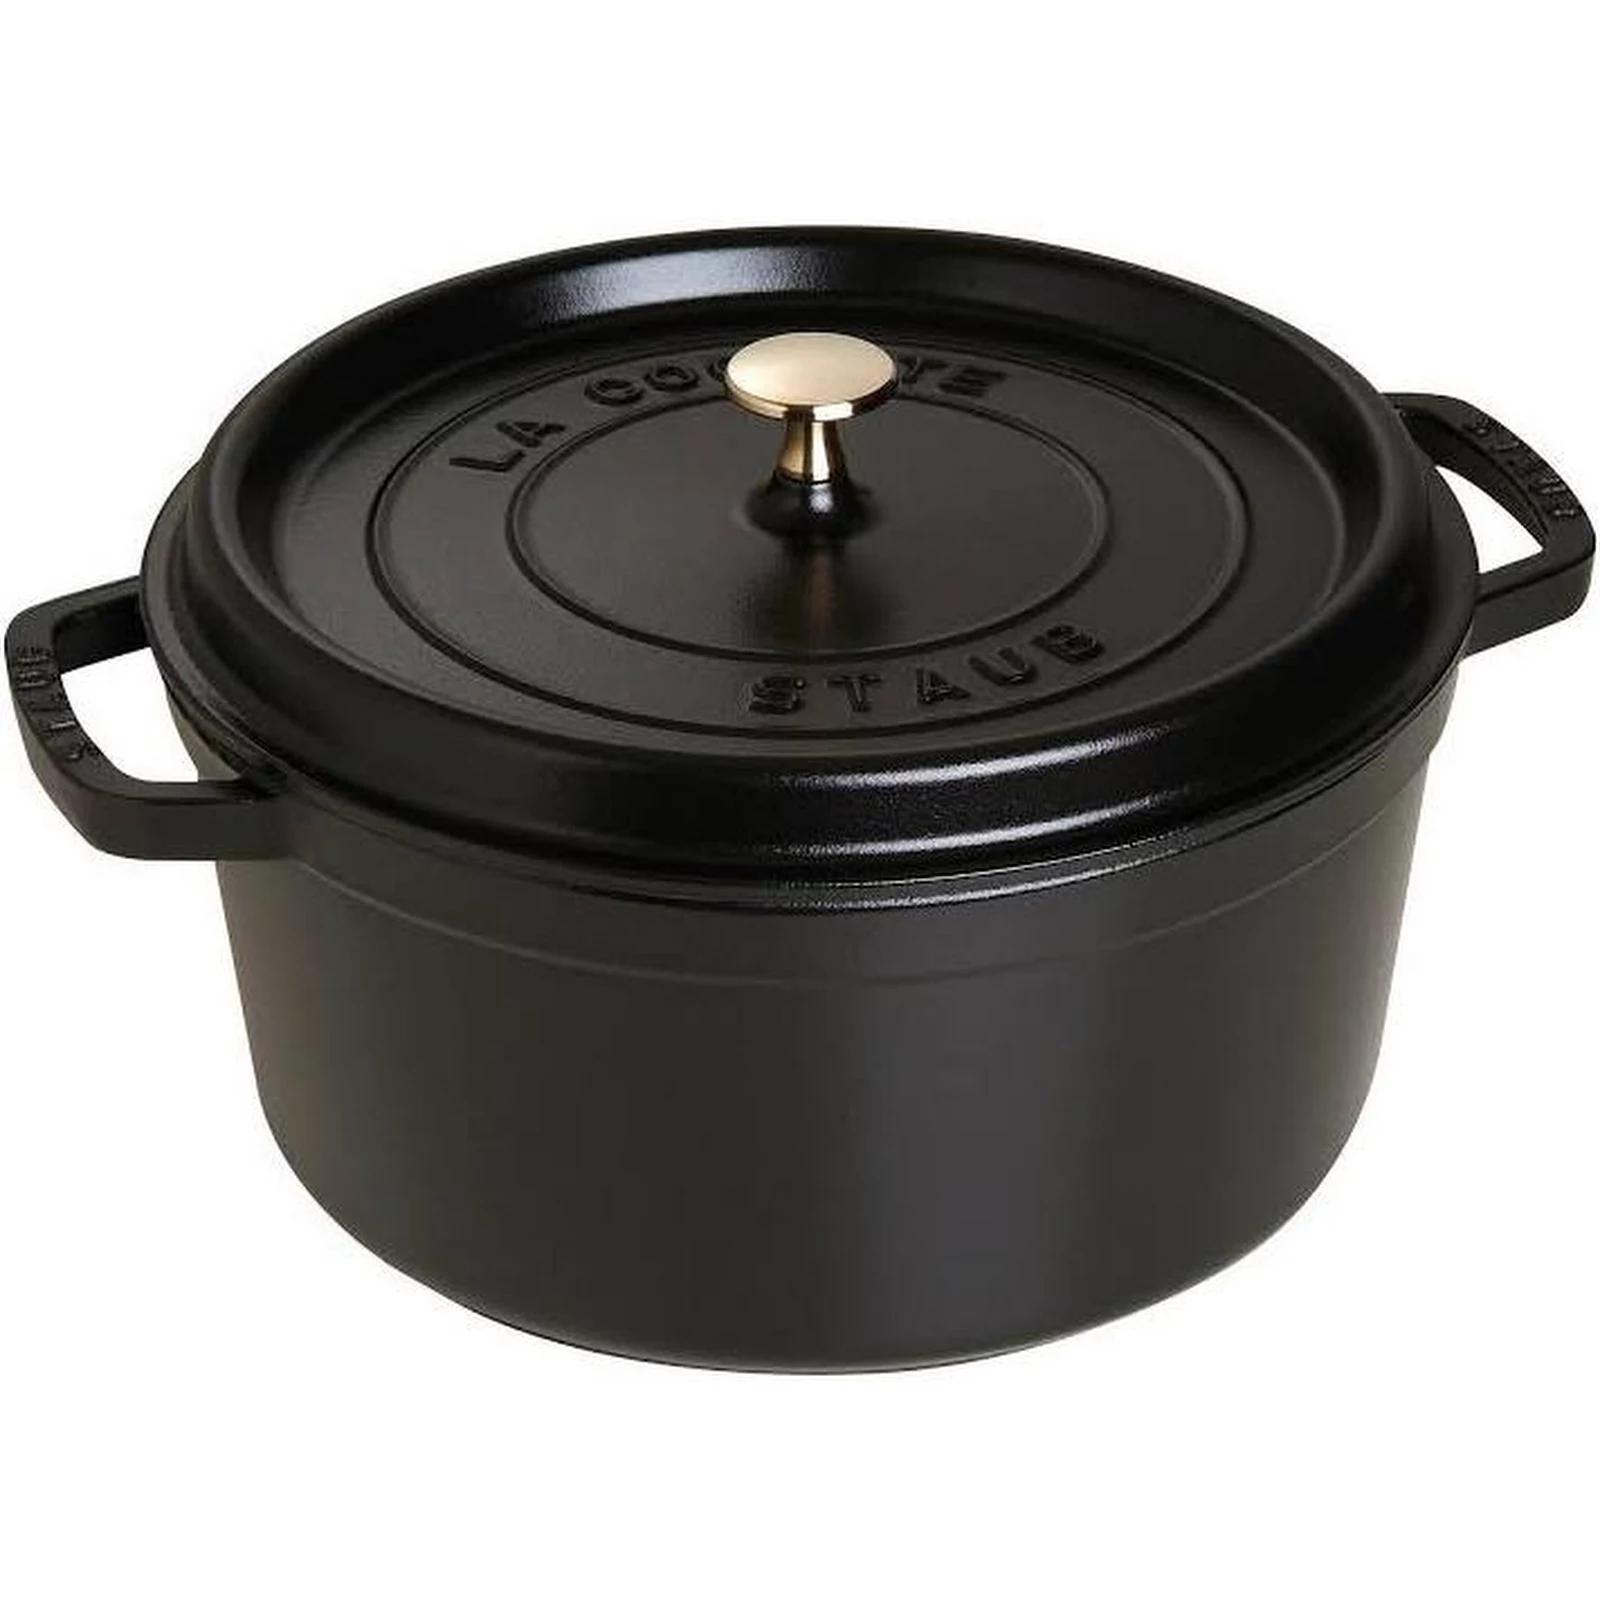 Staub Cast Iron 7-qt Round Cocotte - Black Matte for $100.21 using Google Express Application